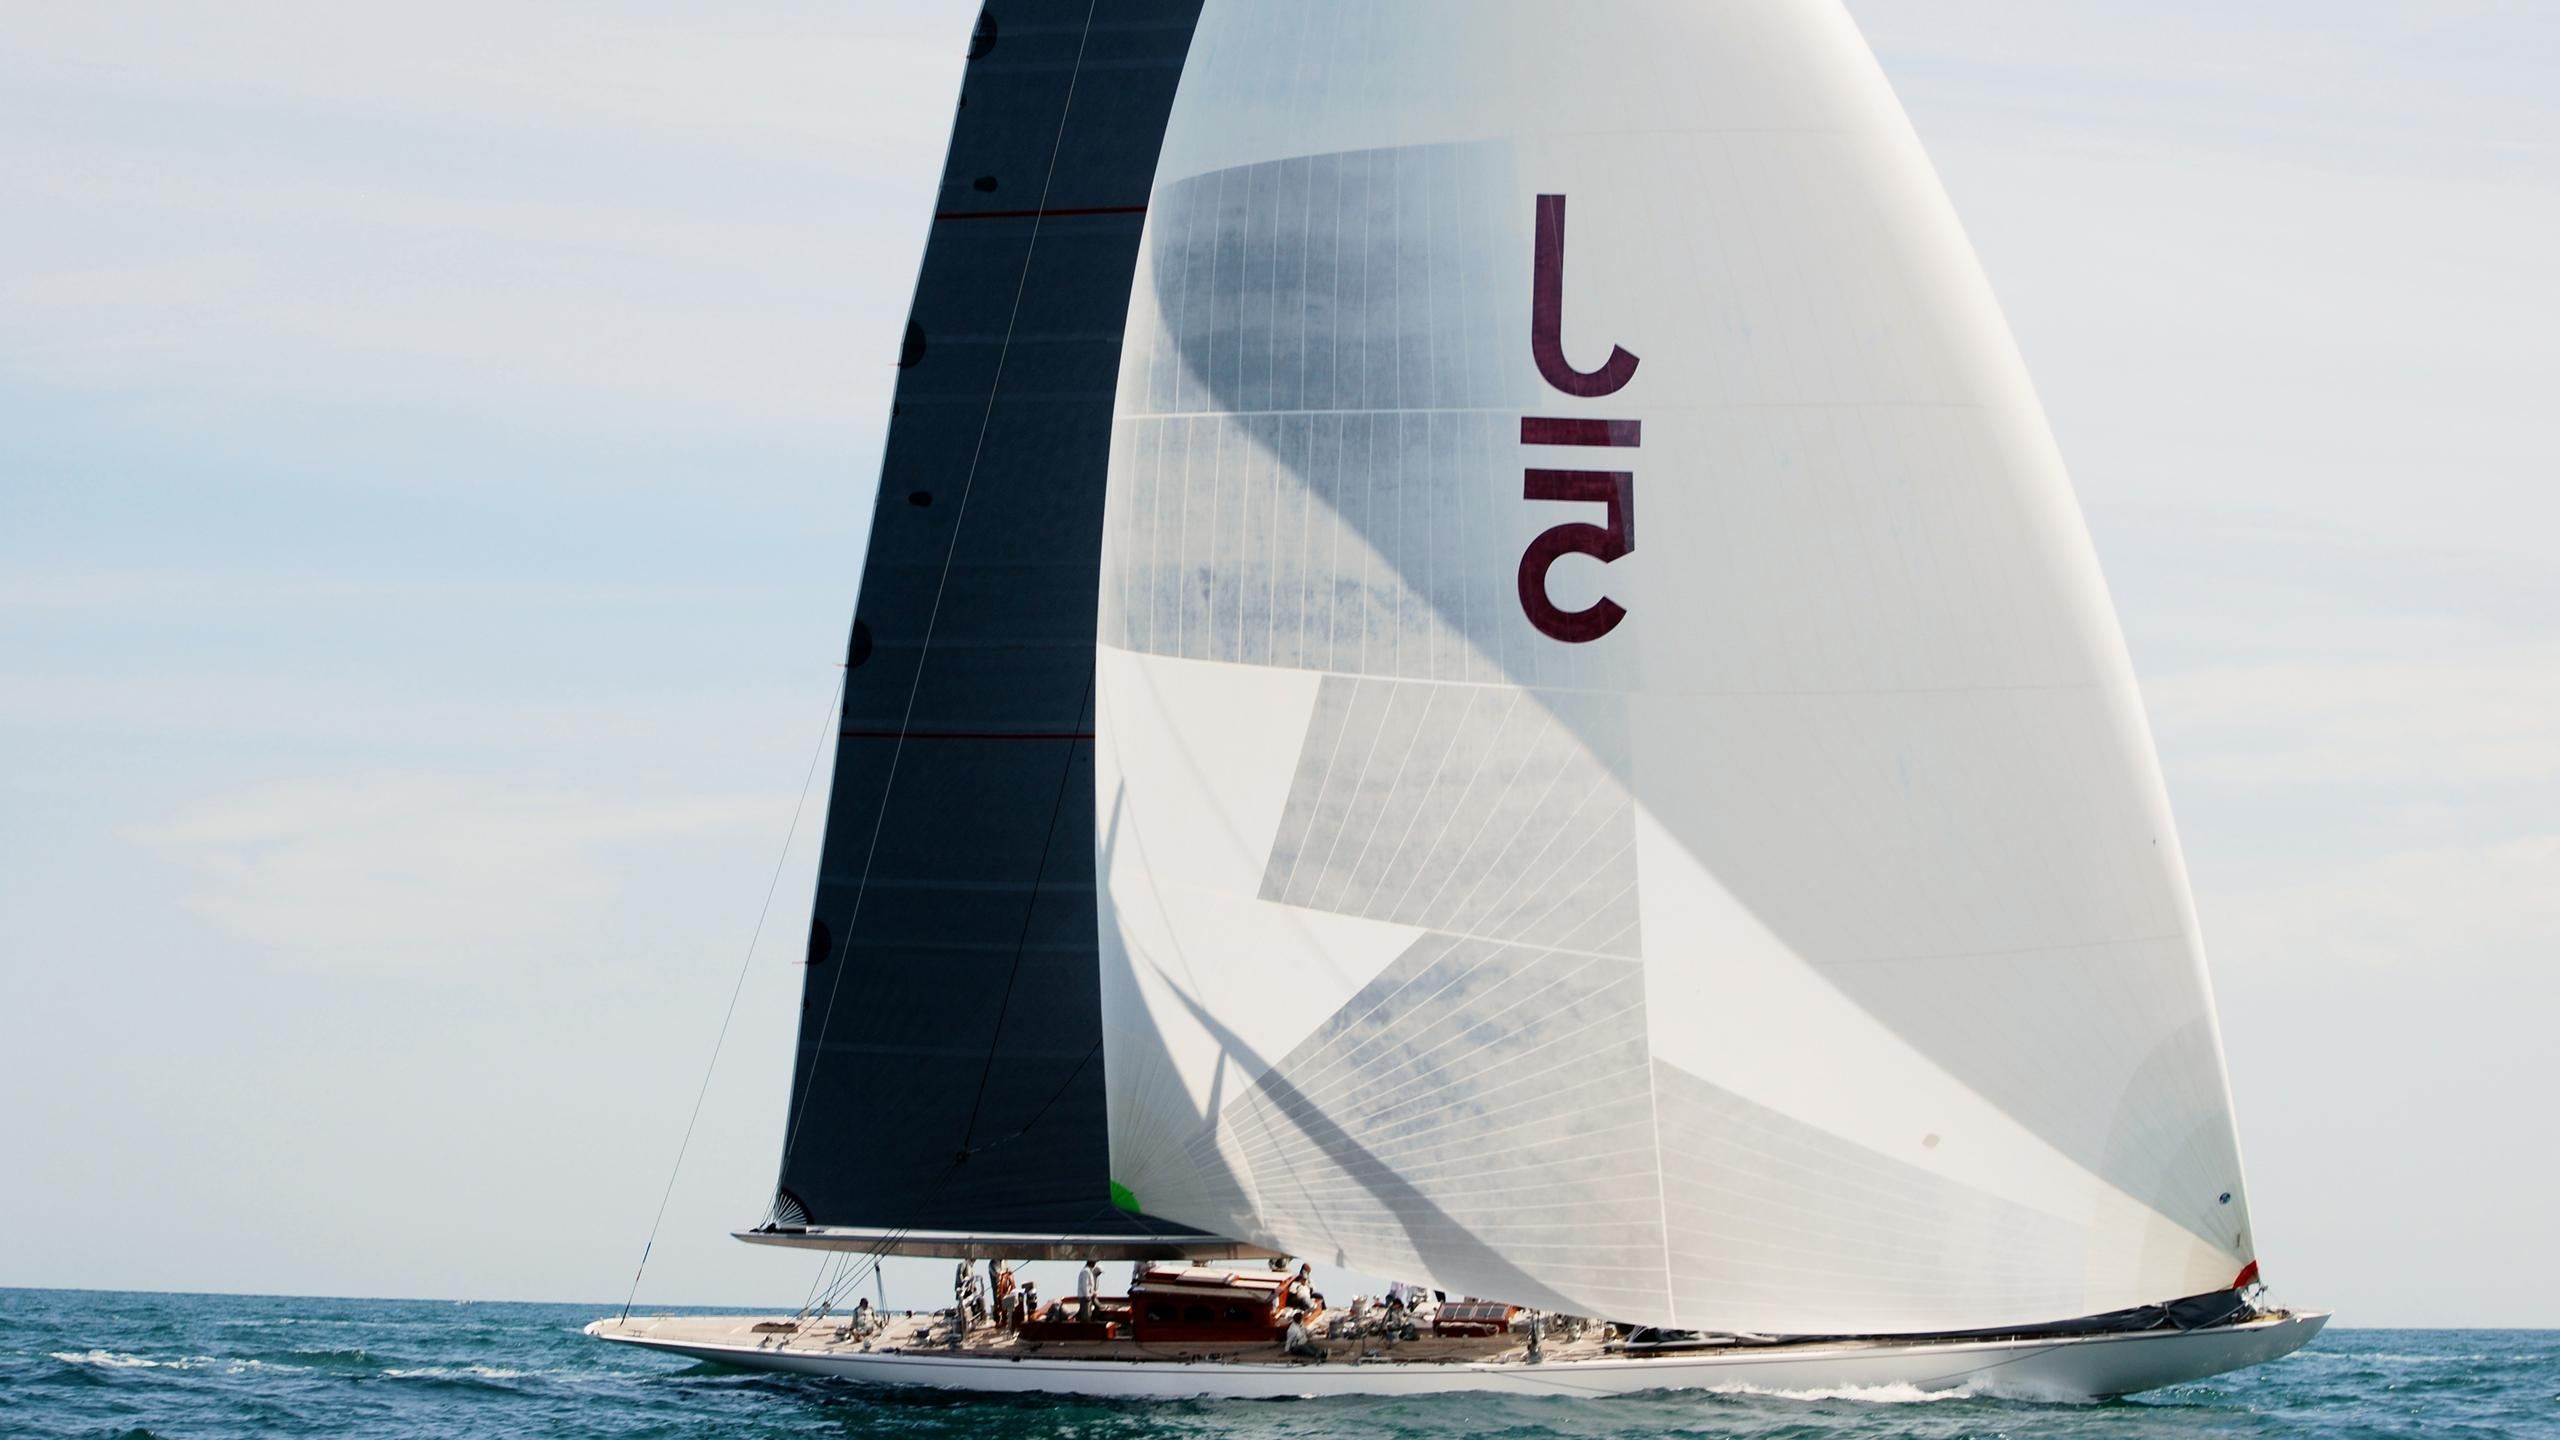 ranger-sailing-yacht-danish-2003-42m-profile-cruising